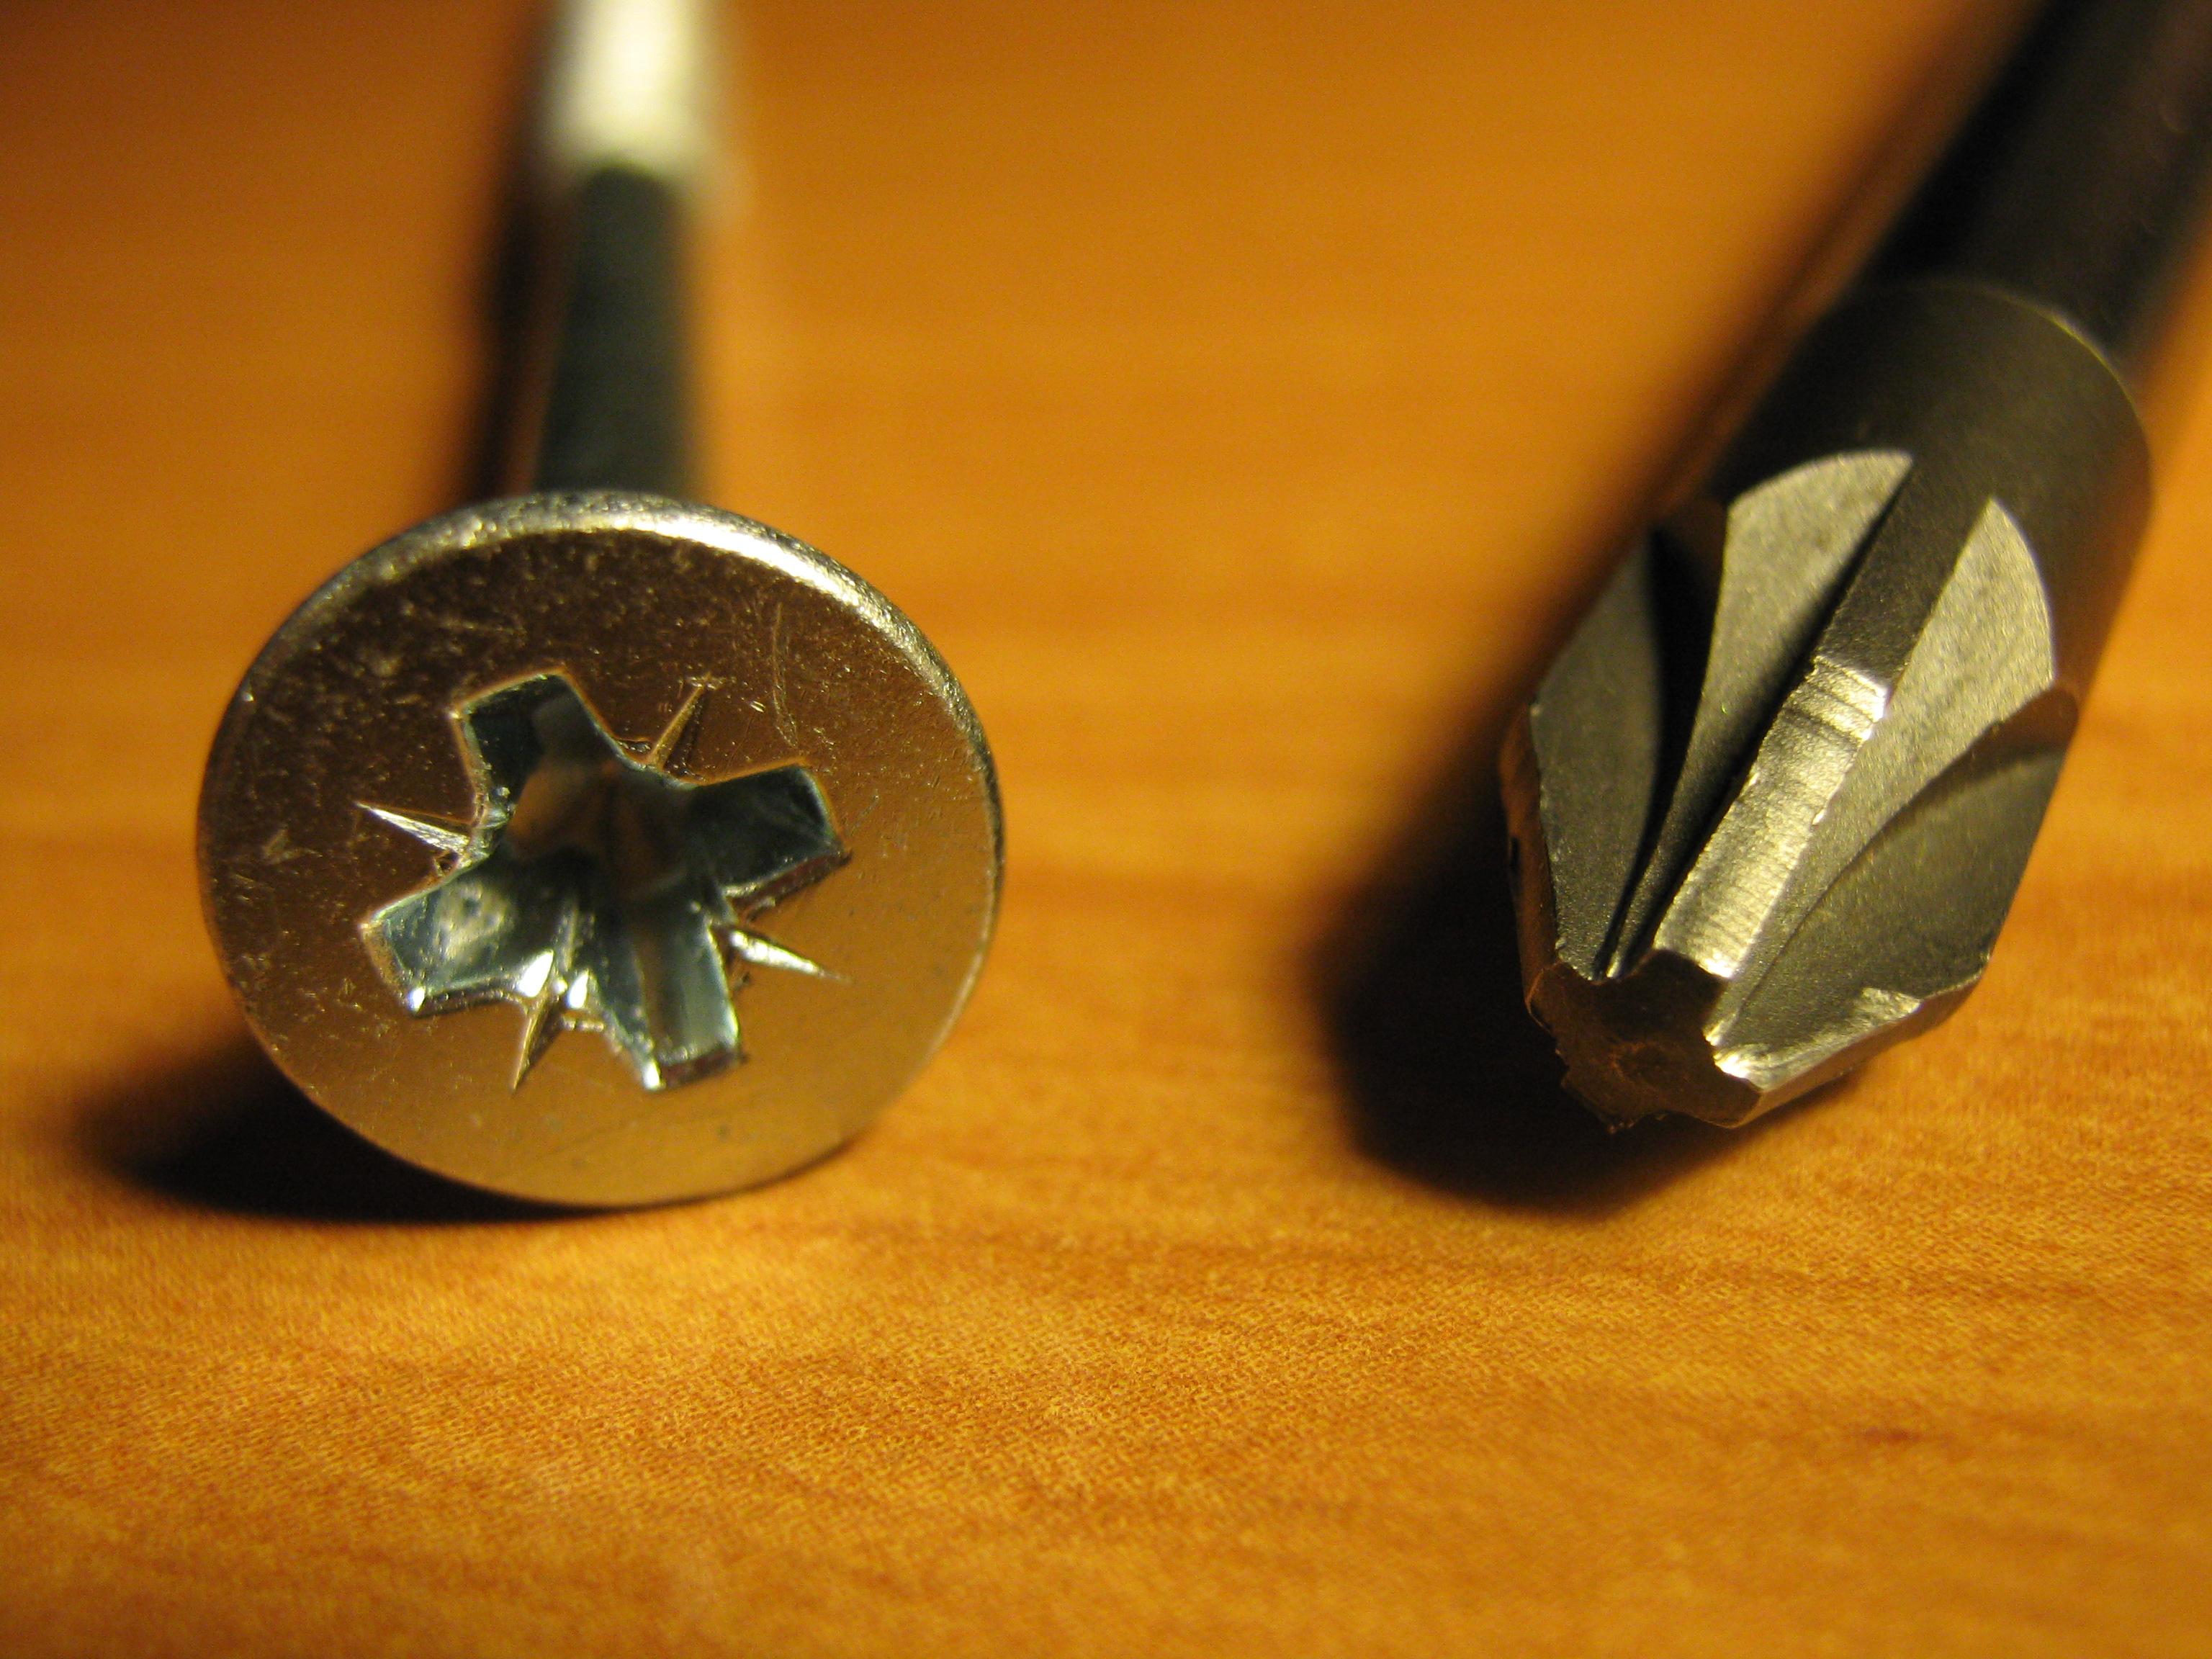 POZIDRIV screwdriver and screw.JPG